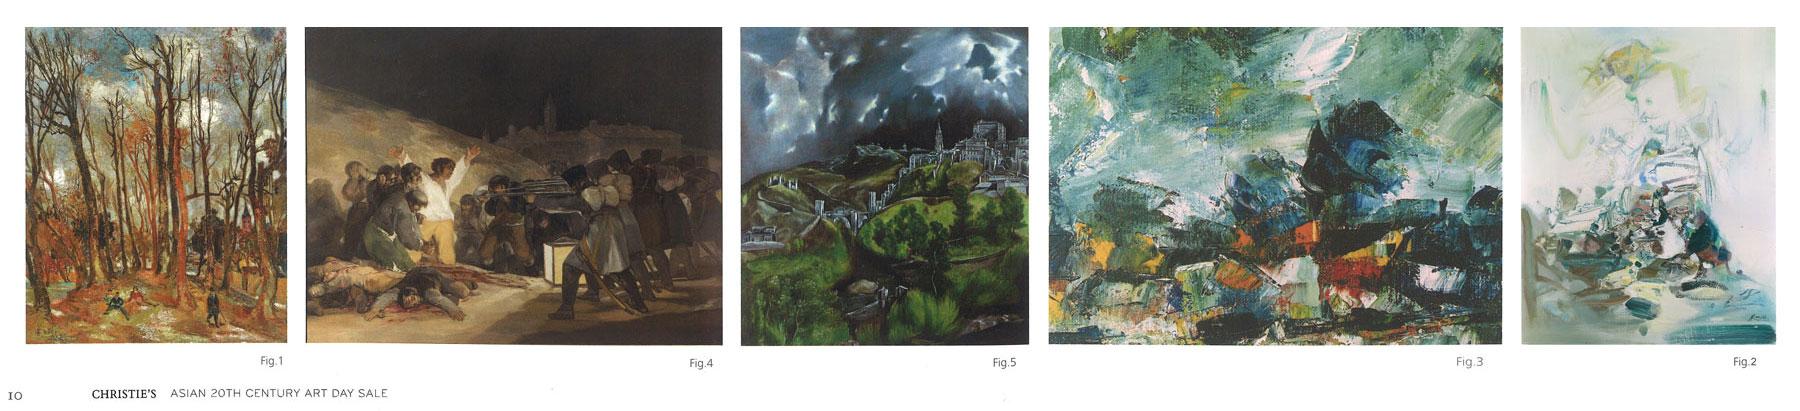 Chu-Teh-Chun-painting-historical-influences